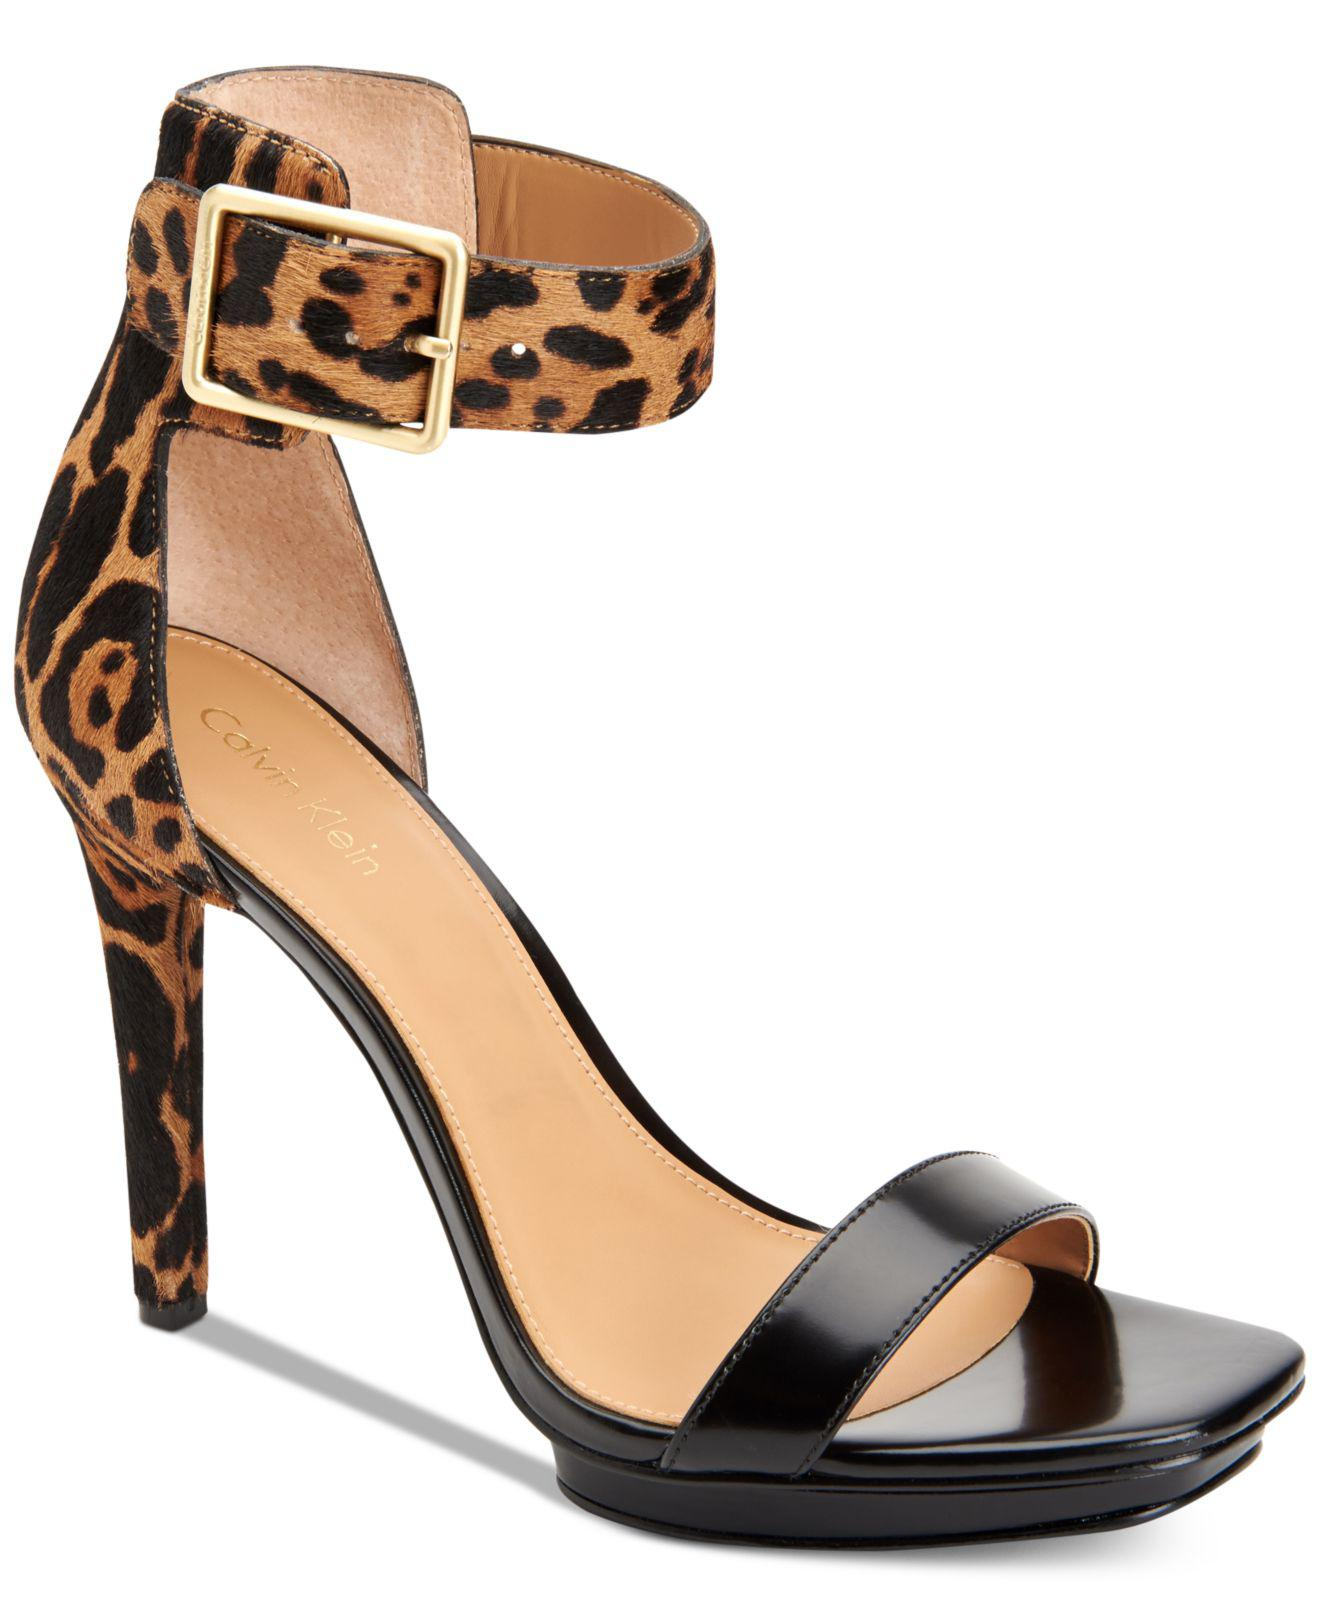 42ecf8e007b Lyst - Calvin Klein Women s Vable Sandals in Black